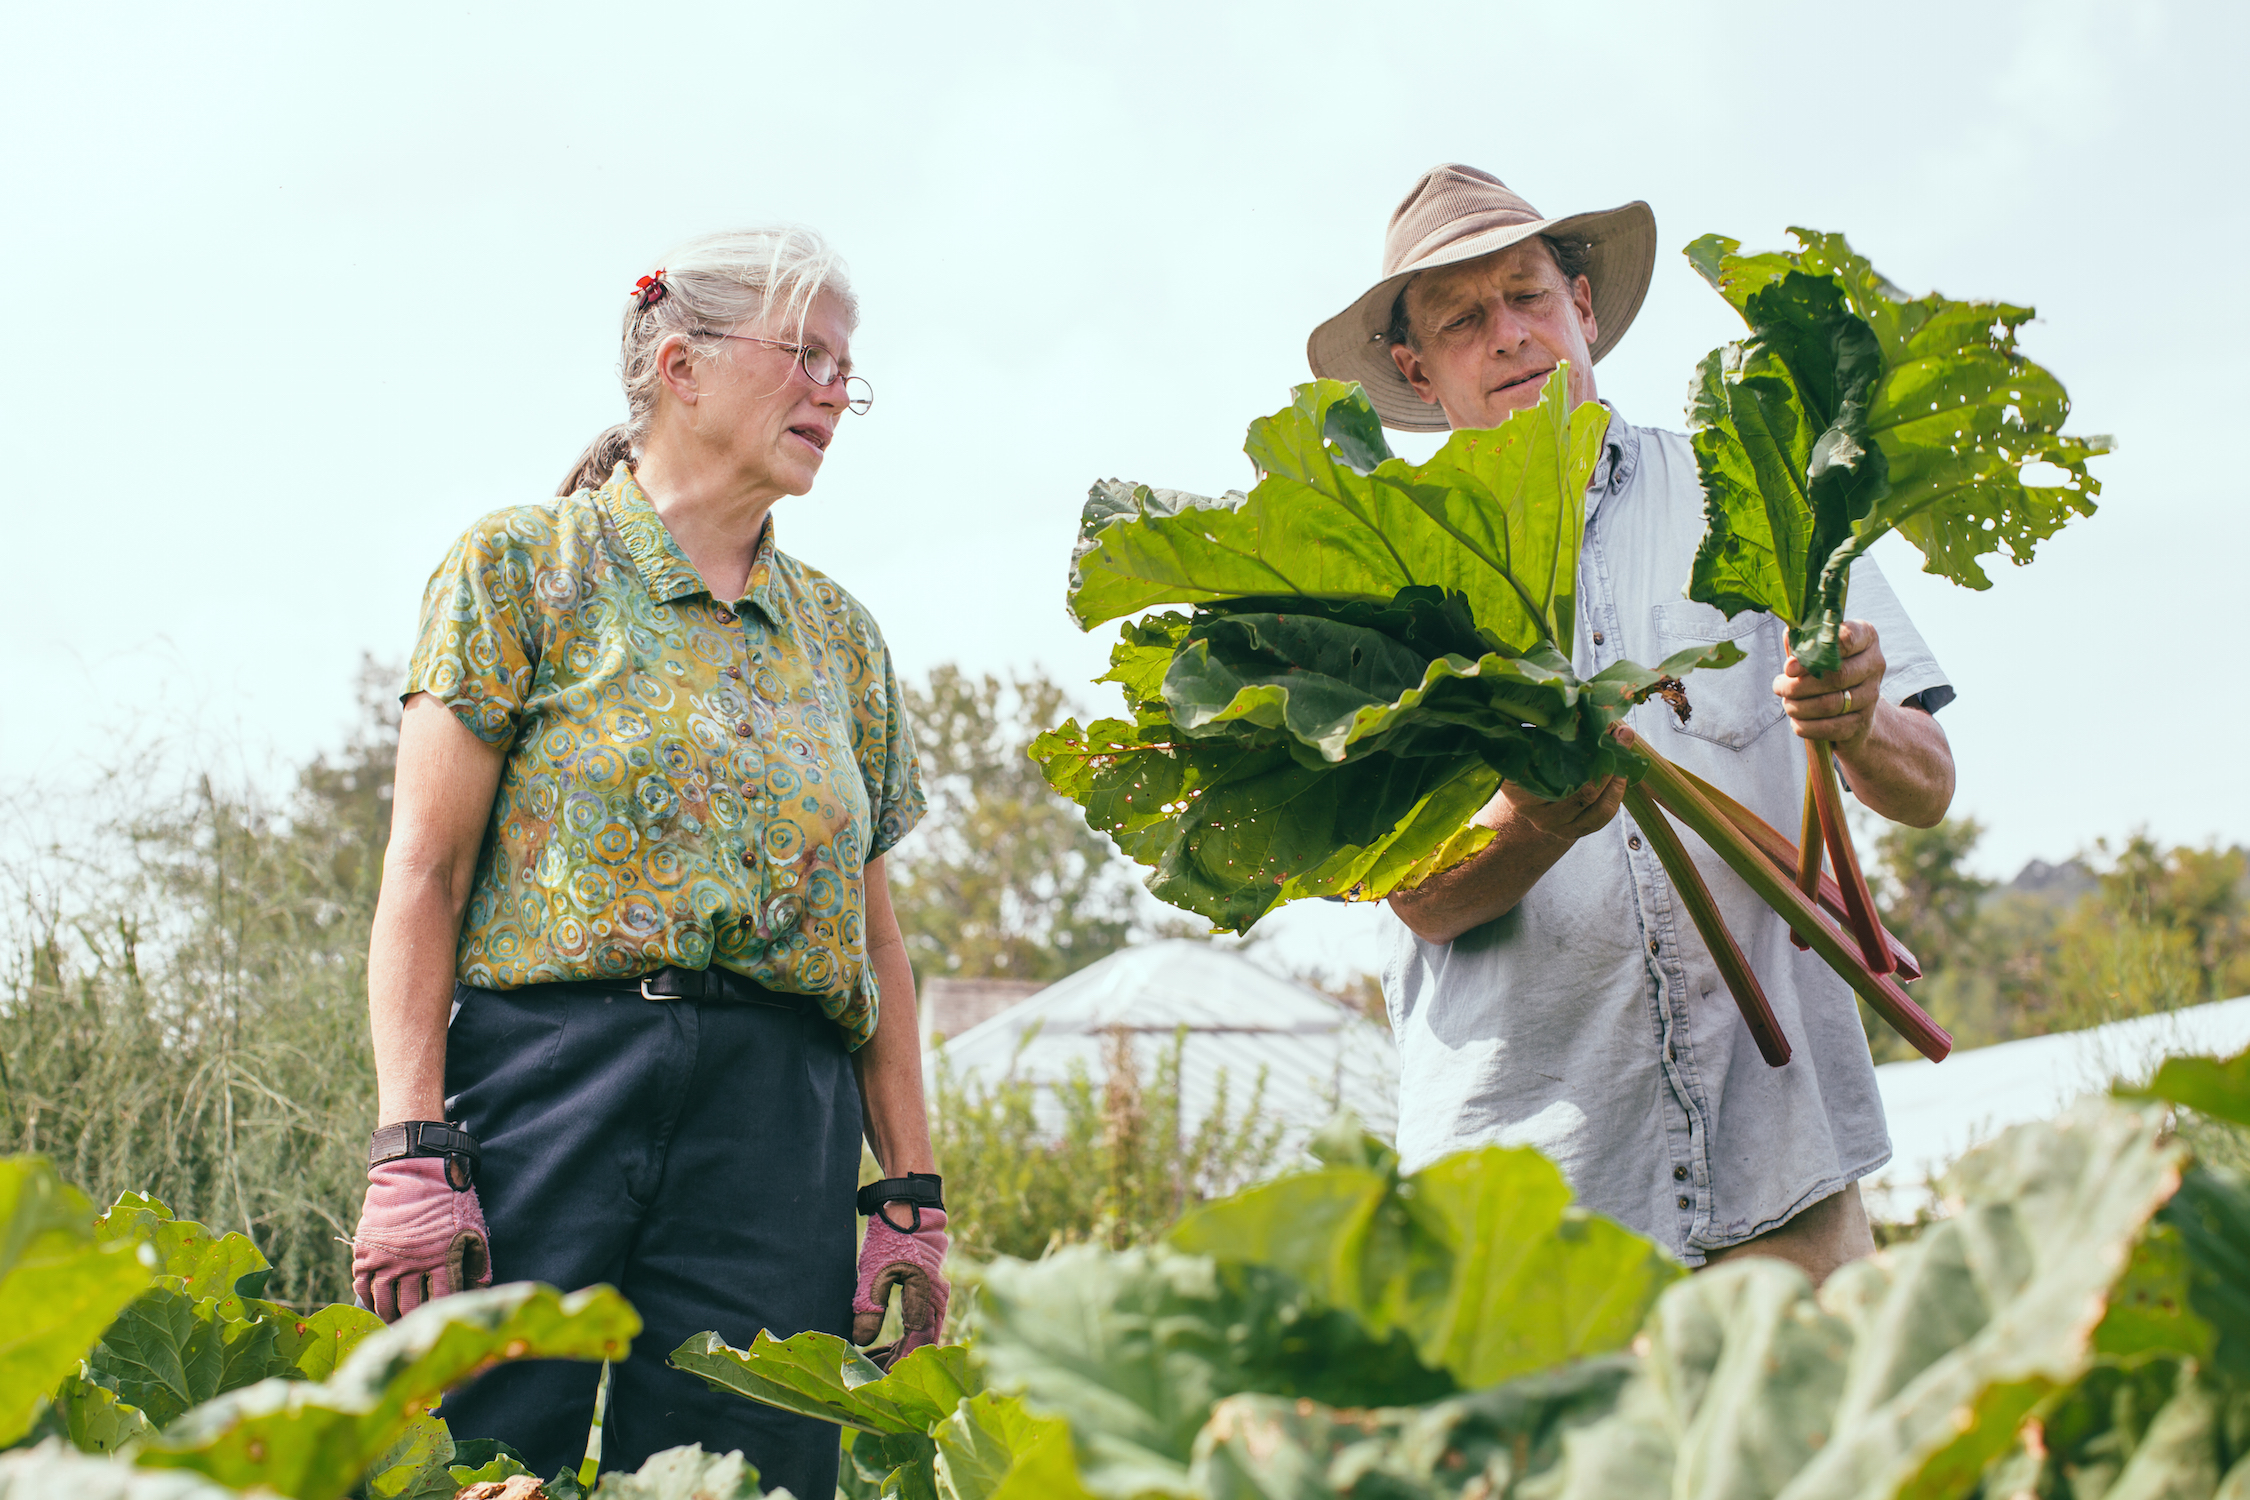 John and Nancy The Farm Between rhubarb